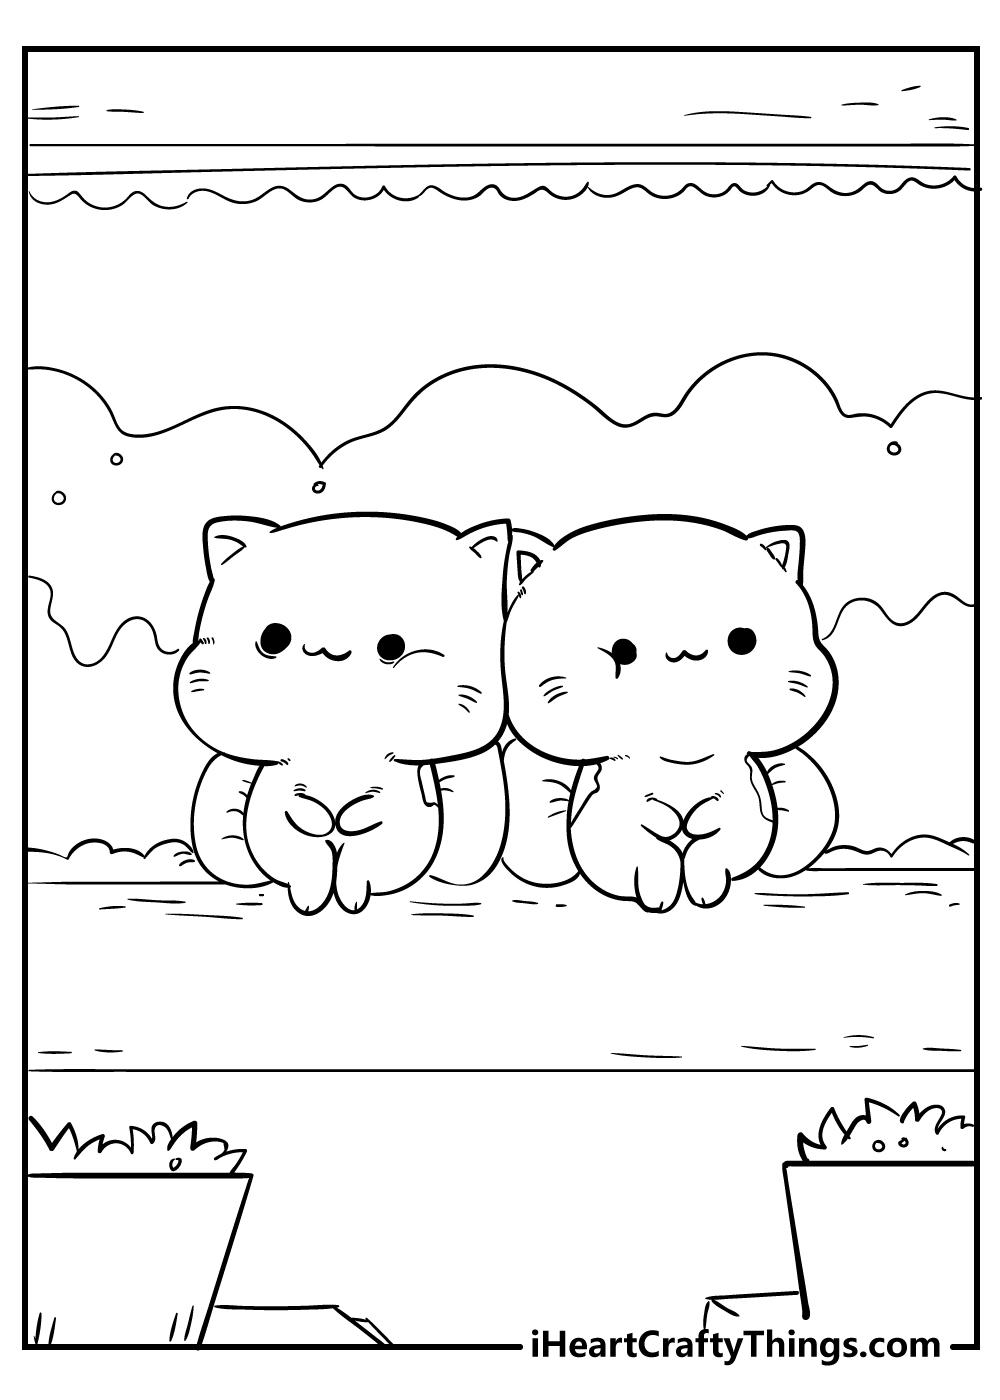 free printable kawaii coloring pages for kids